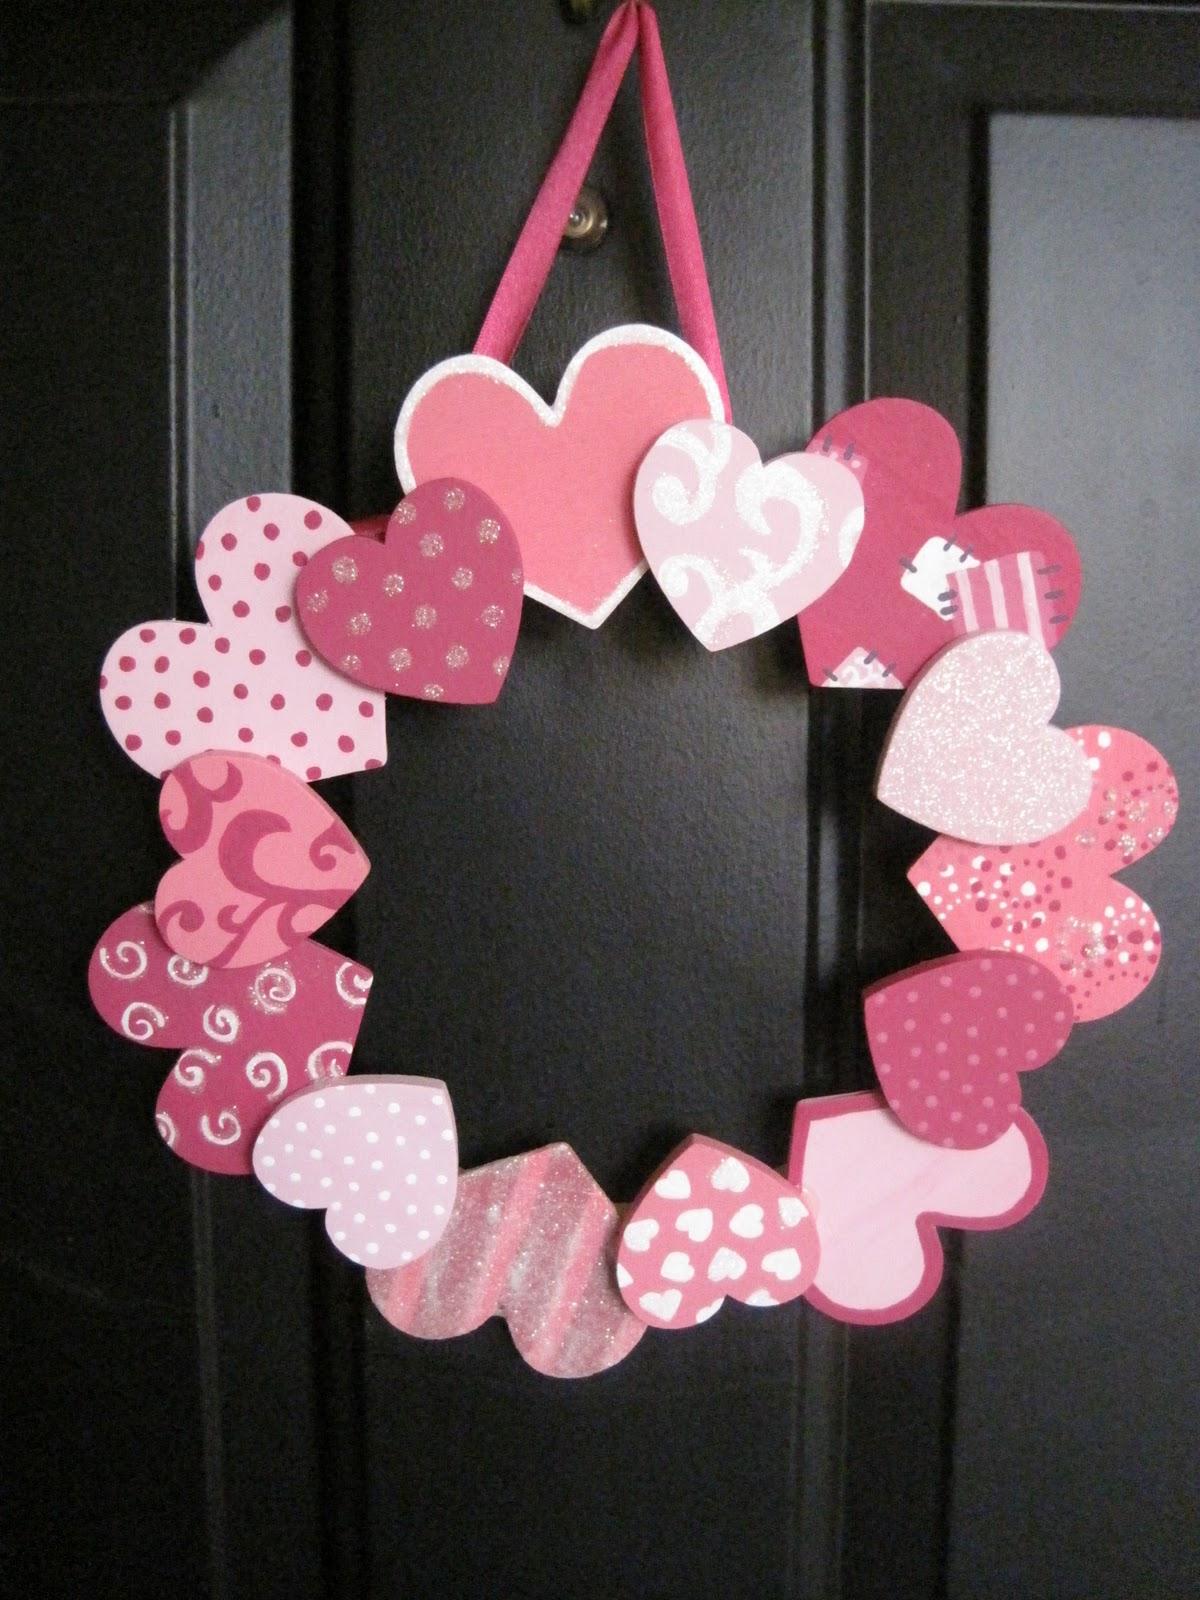 ᐉ валентинки своими руками объемное сердце. валентинка своими руками отзывы. венок из сердечек ✅ igrad.su